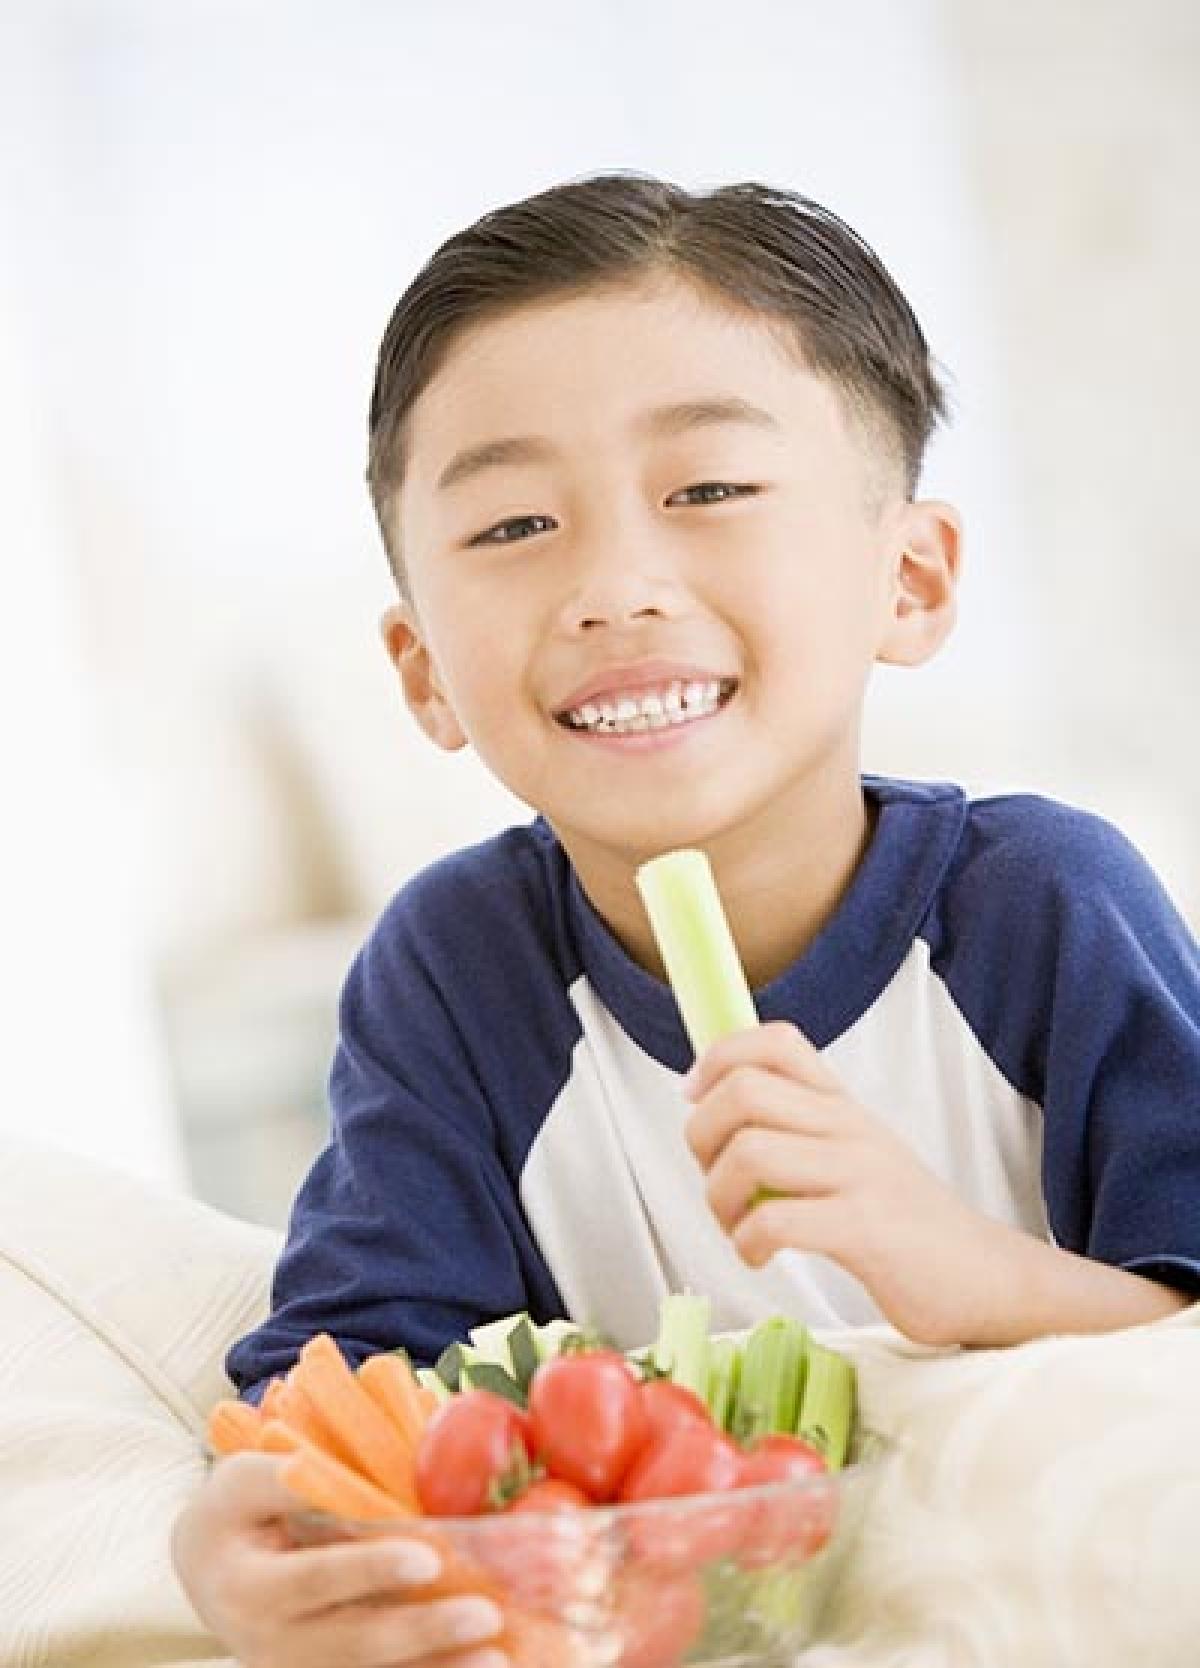 Smileys make kids eat healthy